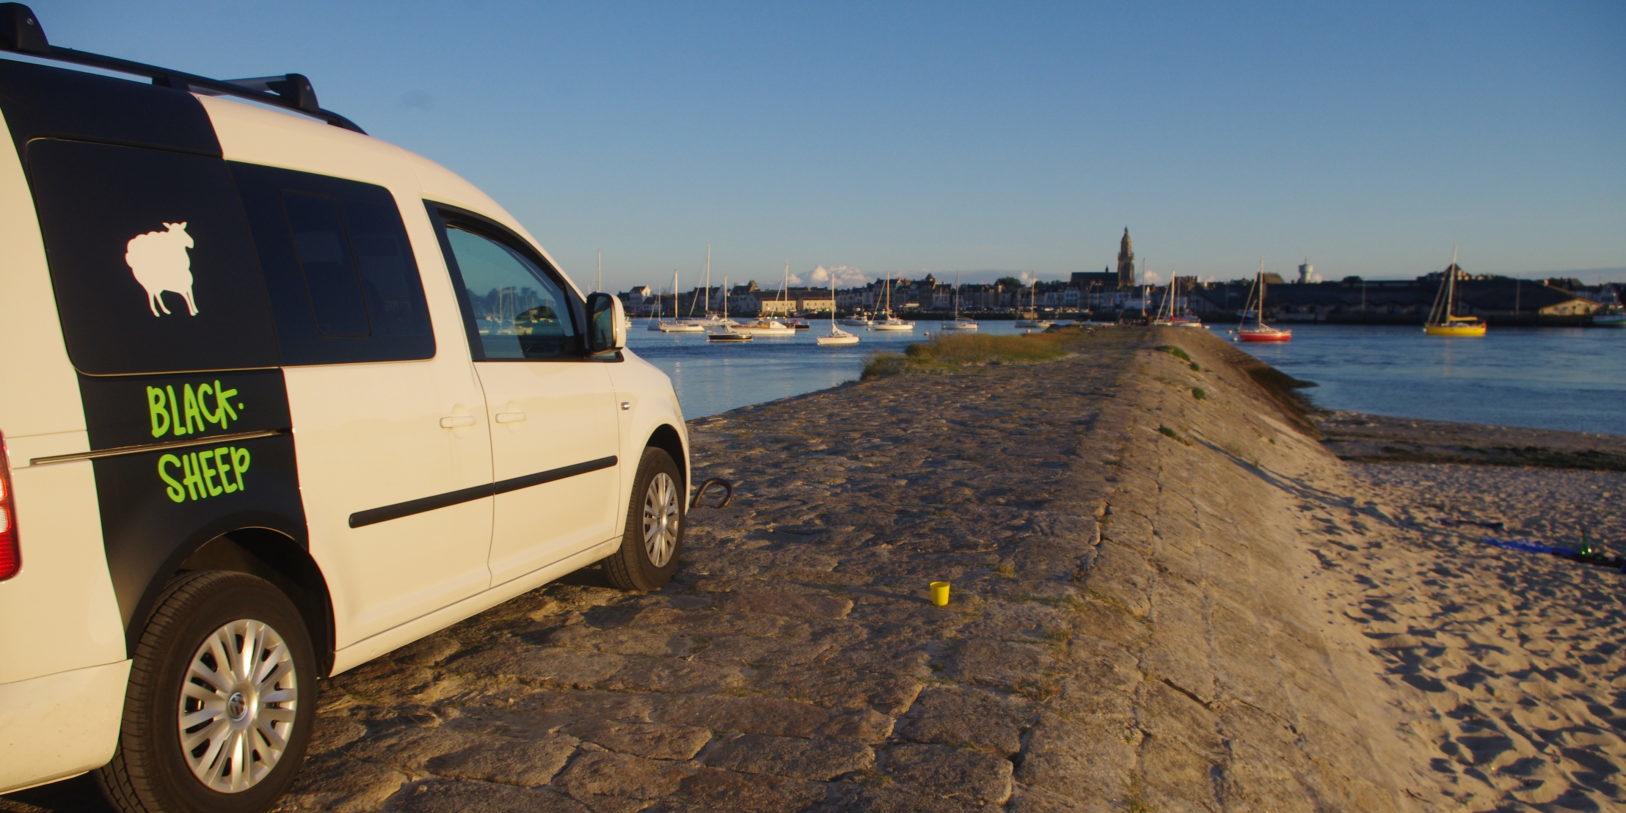 Corsica Frankrijk campervans Blacksheep minivan BLACKSHEEP kade pier water bootjes